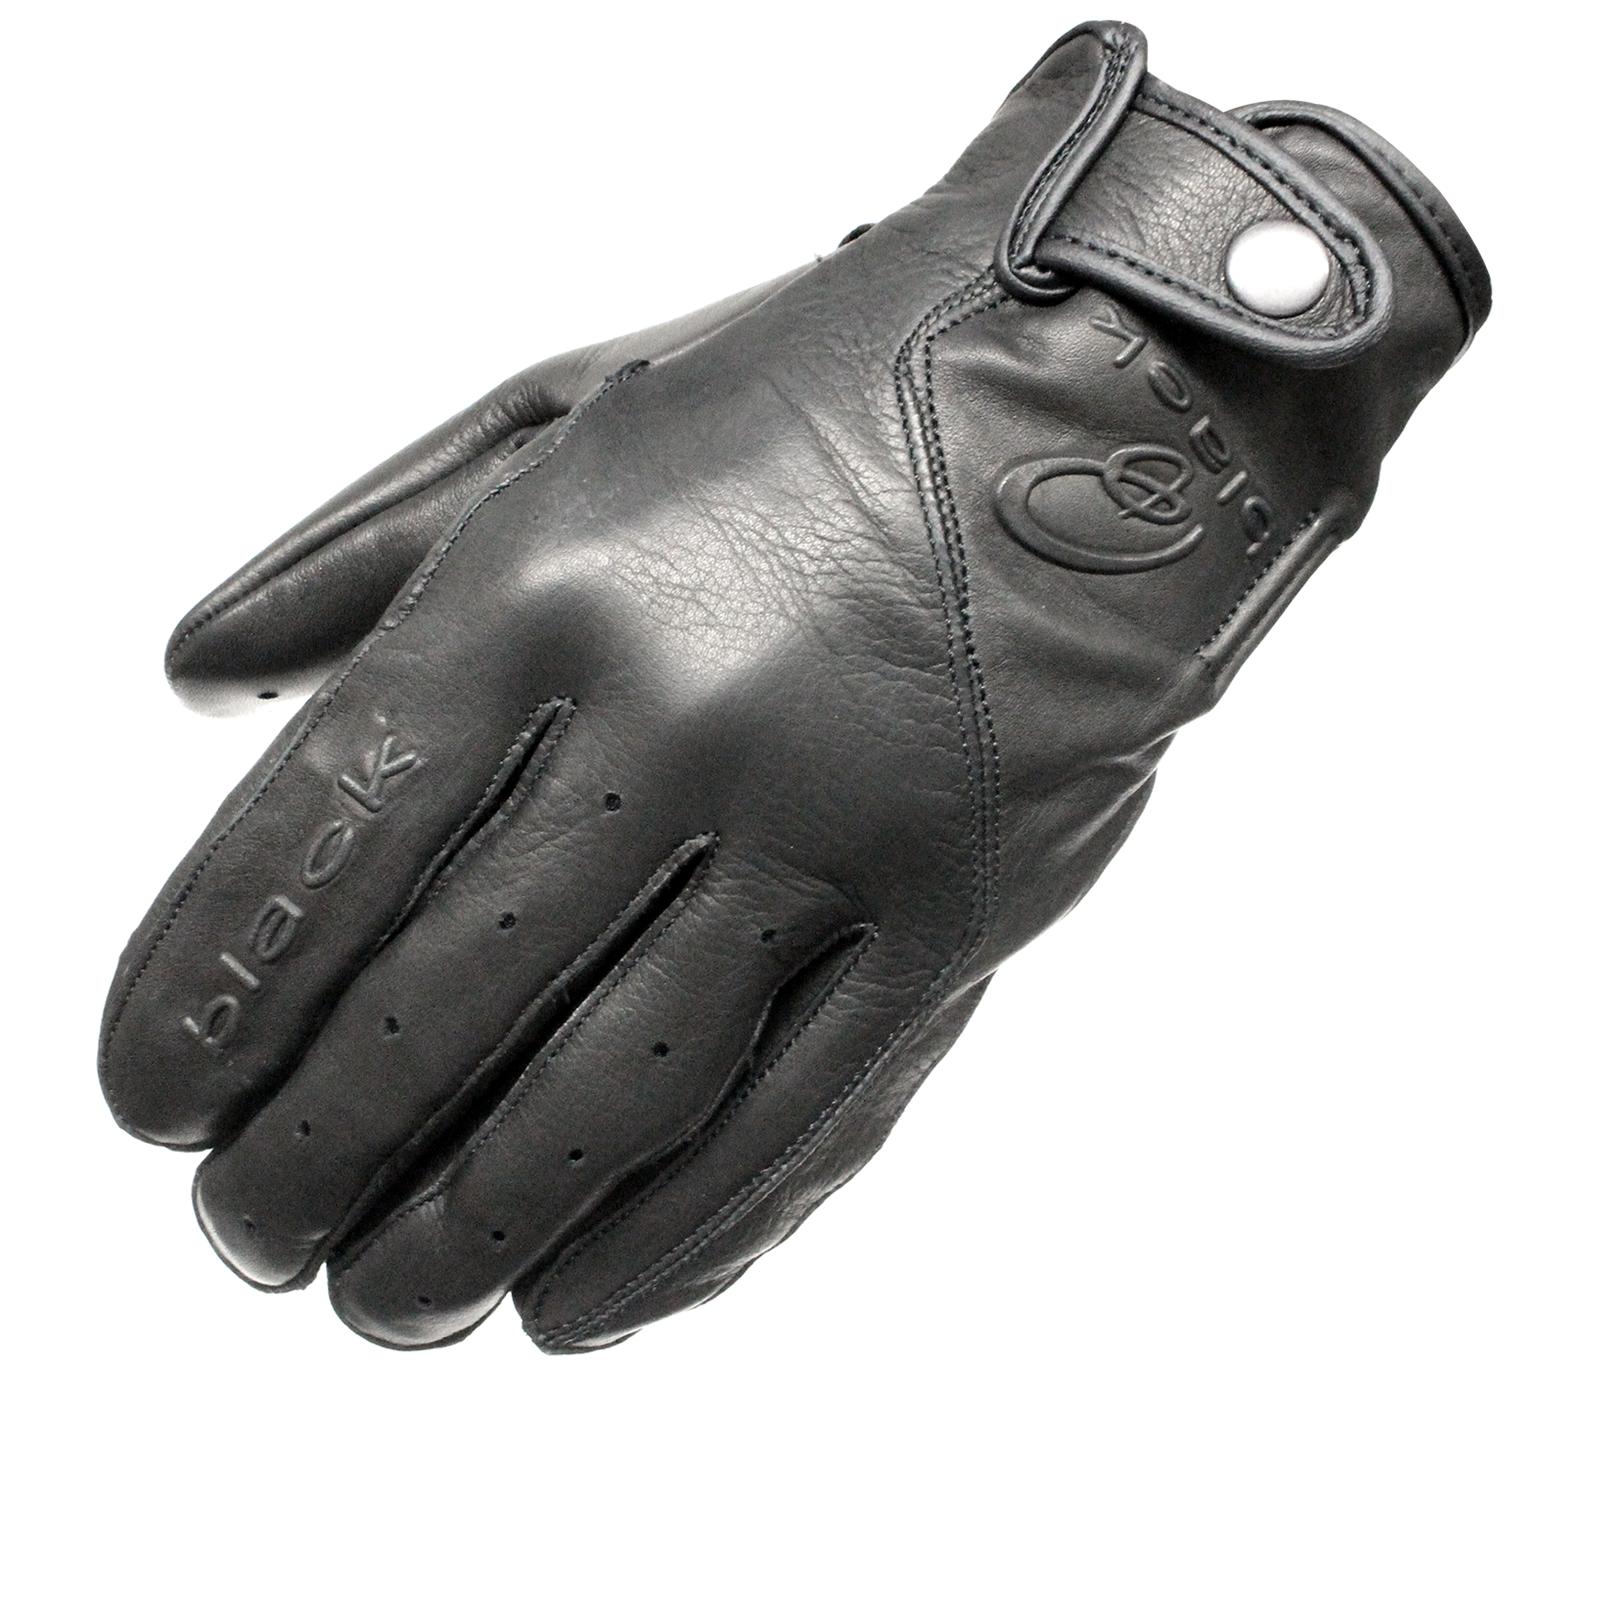 Buy leather bike gloves -